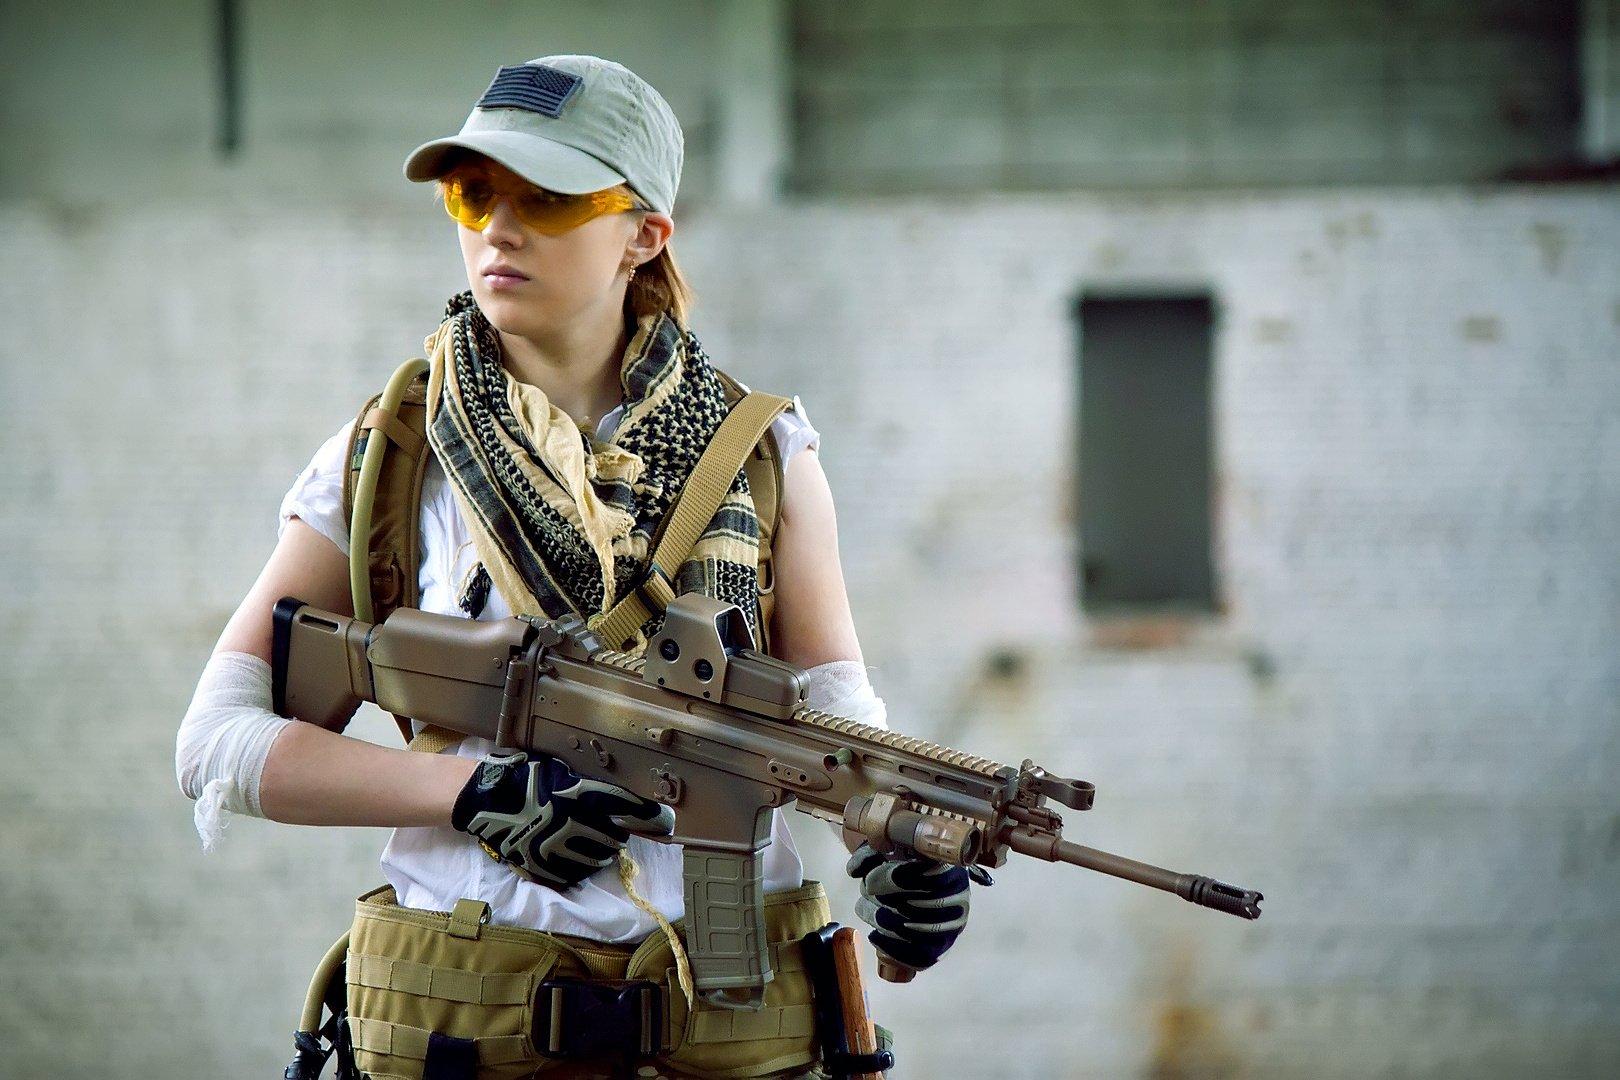 gun girl computer wallpapers - photo #47